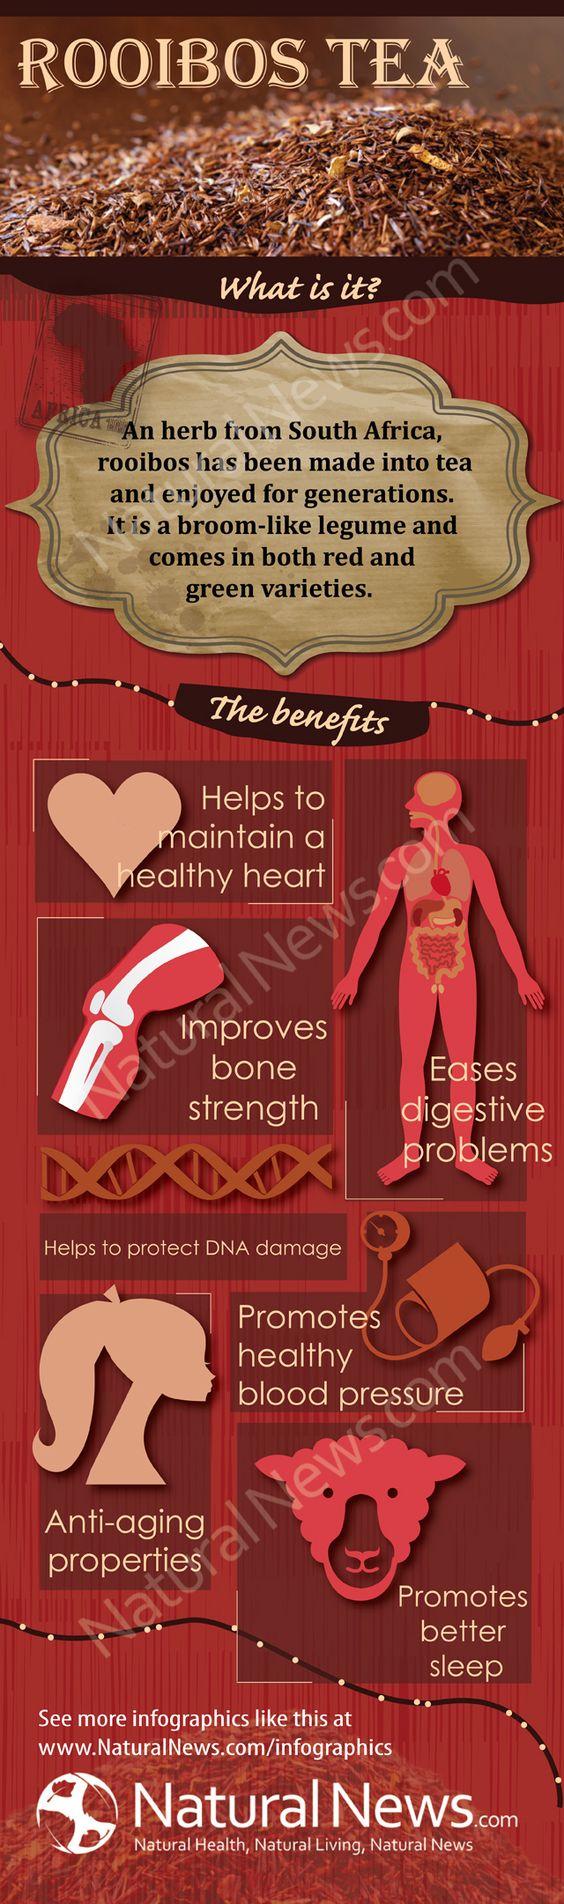 Rooibos Tea and its Health Benefits